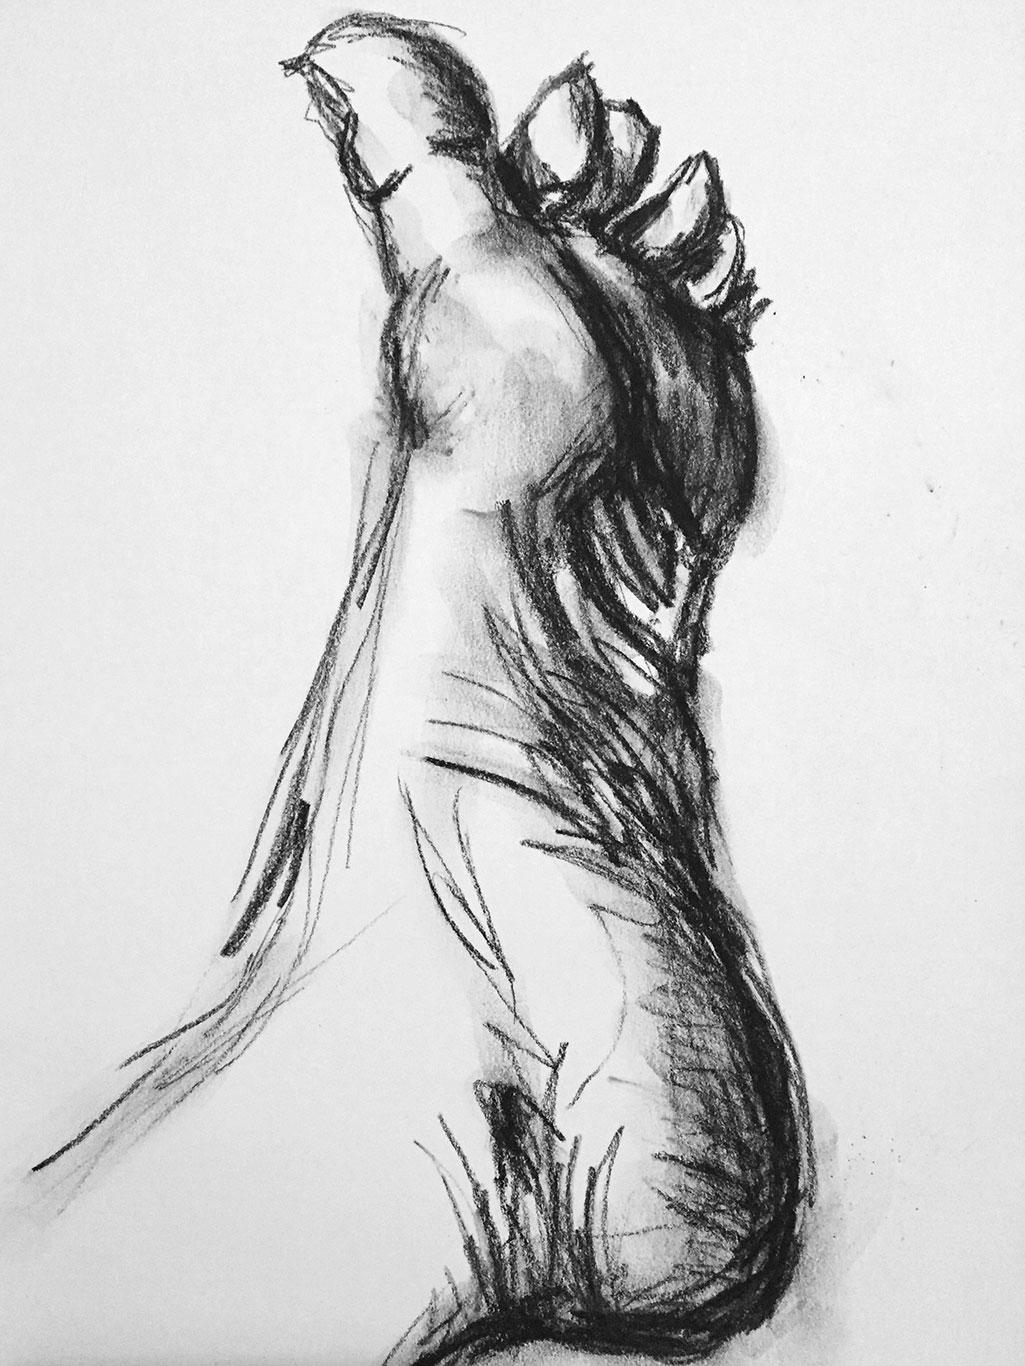 Gesture Drawing, Graphite, Susan Brents-Sheldon, USA